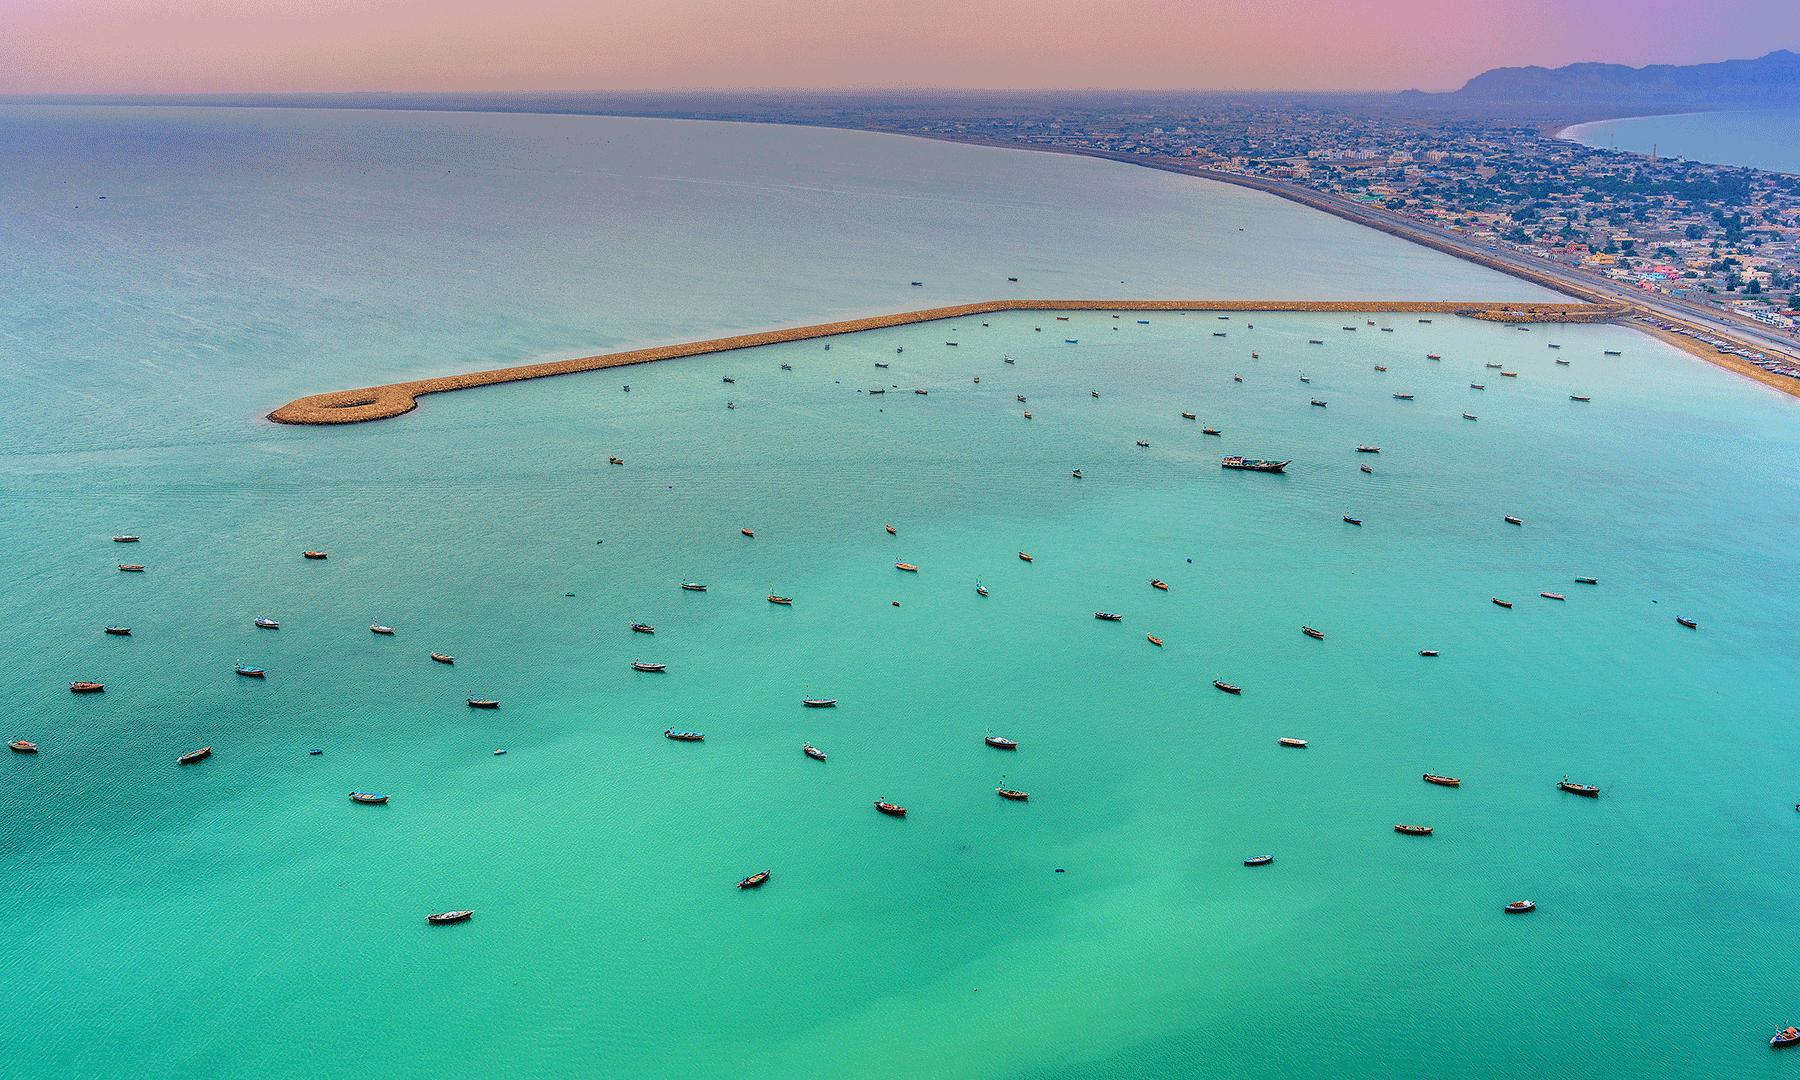 Gwadar's view-Syed Mehdi Bukhari